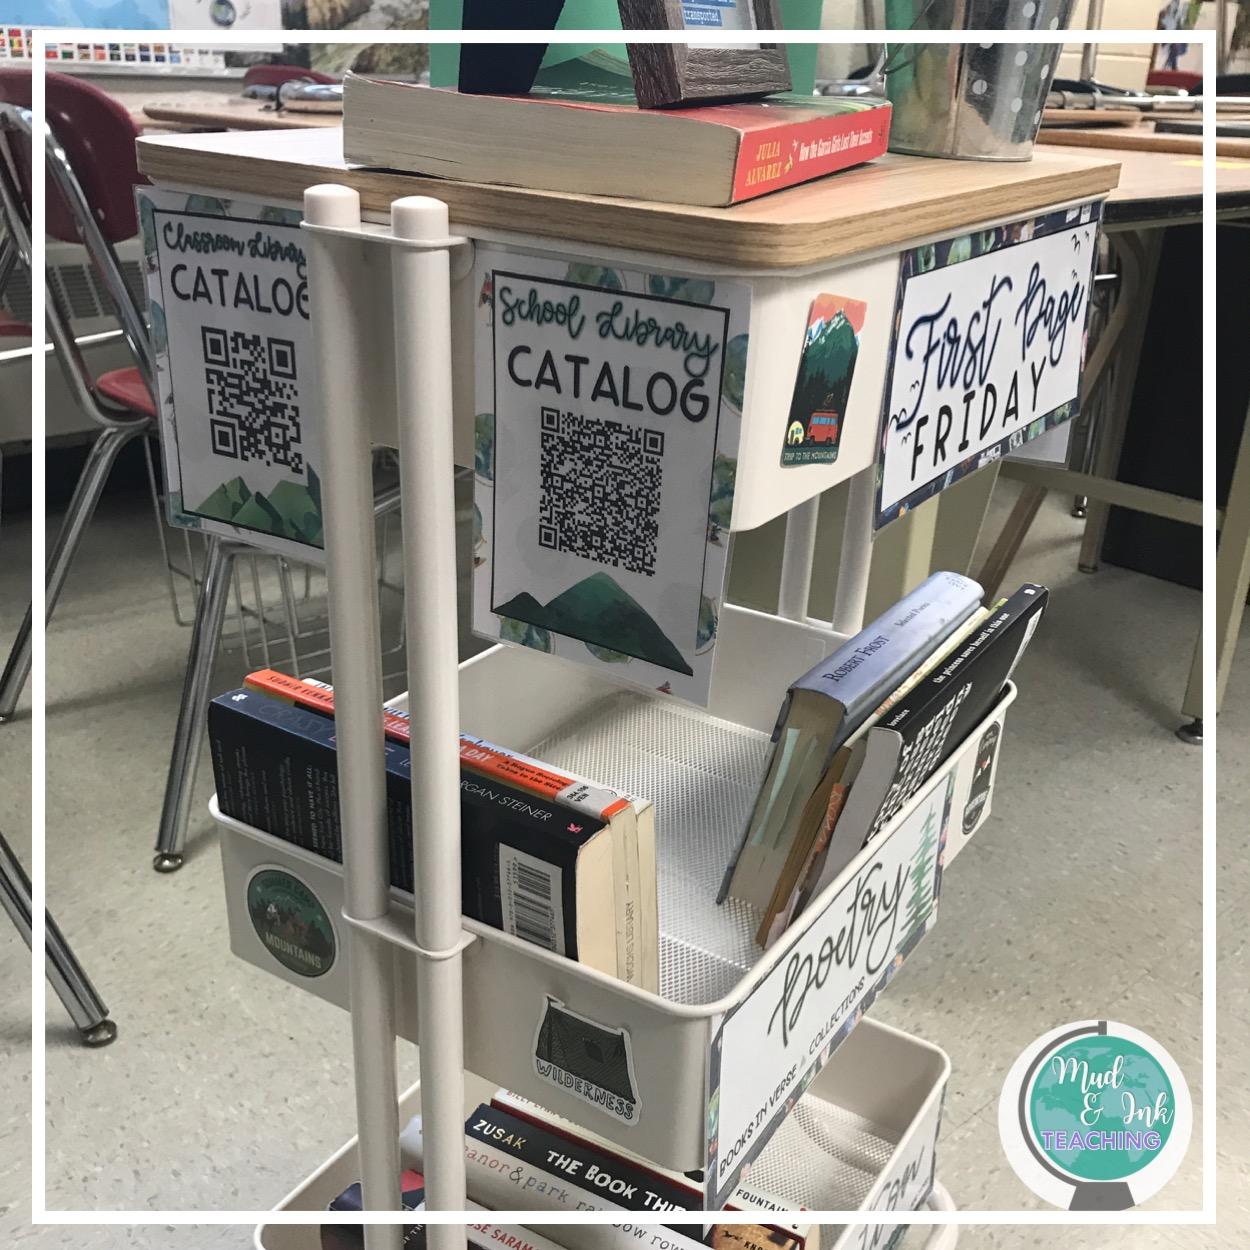 Classroom Library Photo 1.jpg